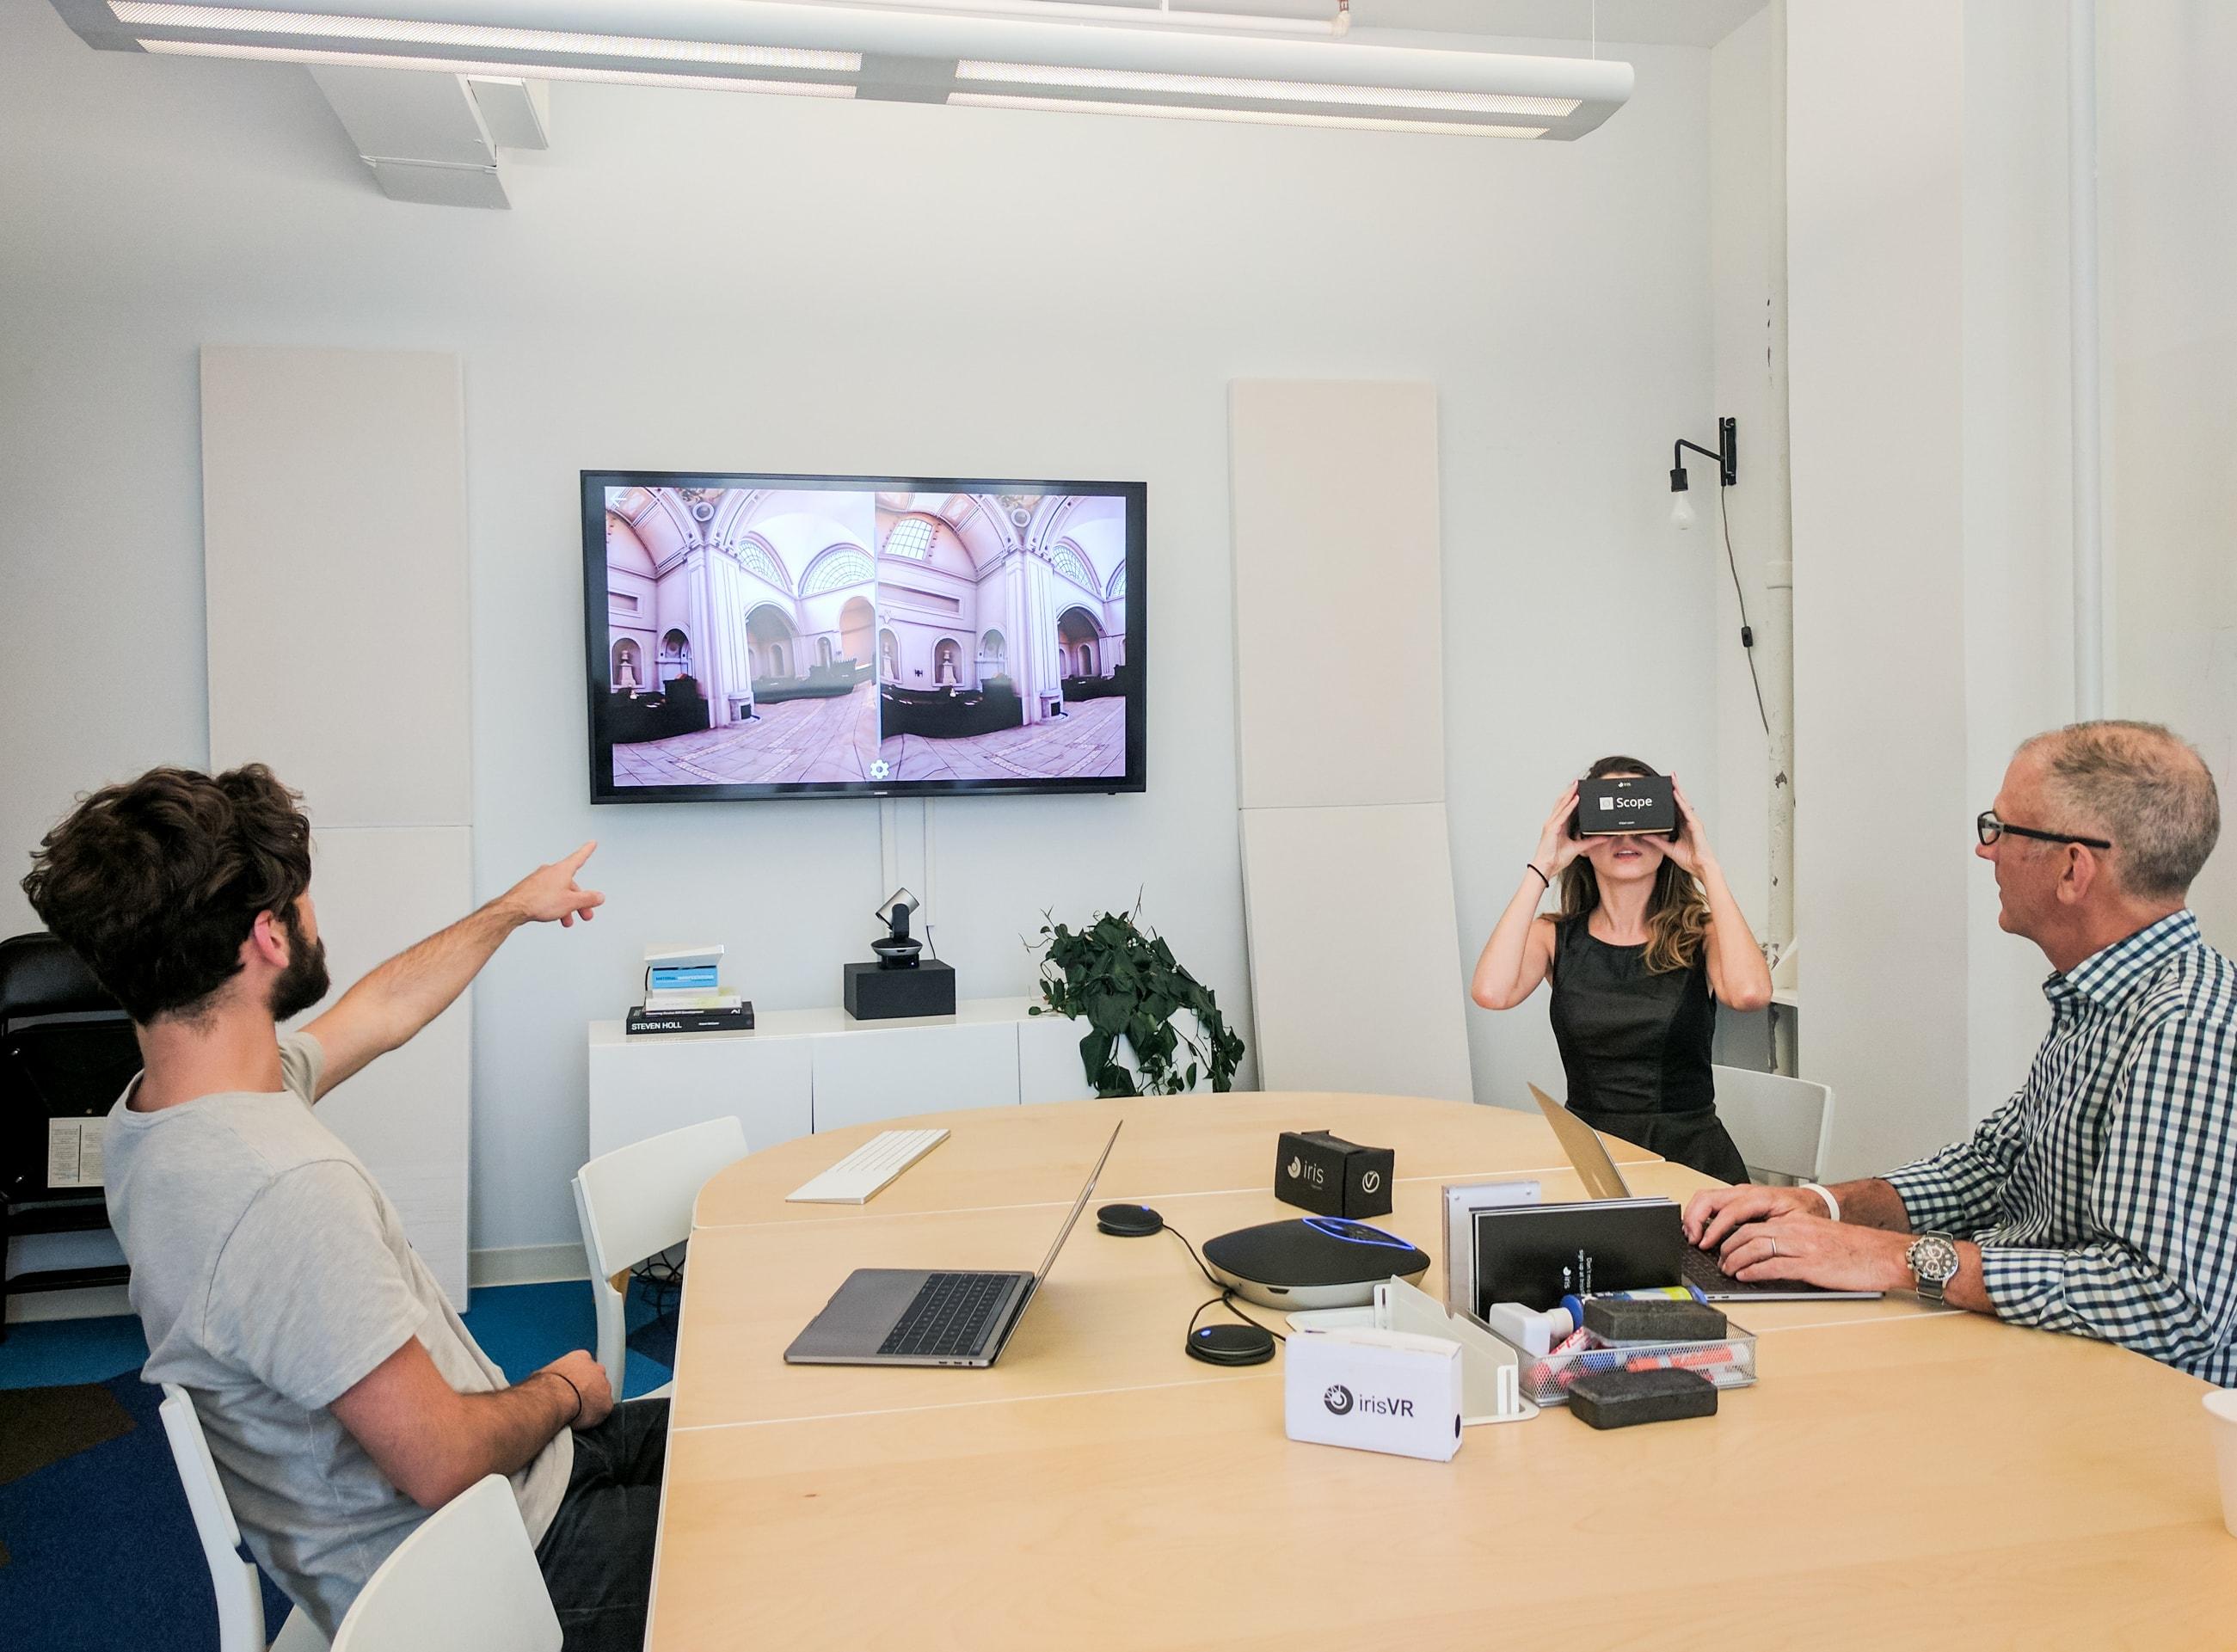 ad43756e756 Screen Mirroring for Presentations Meetings – IrisVR